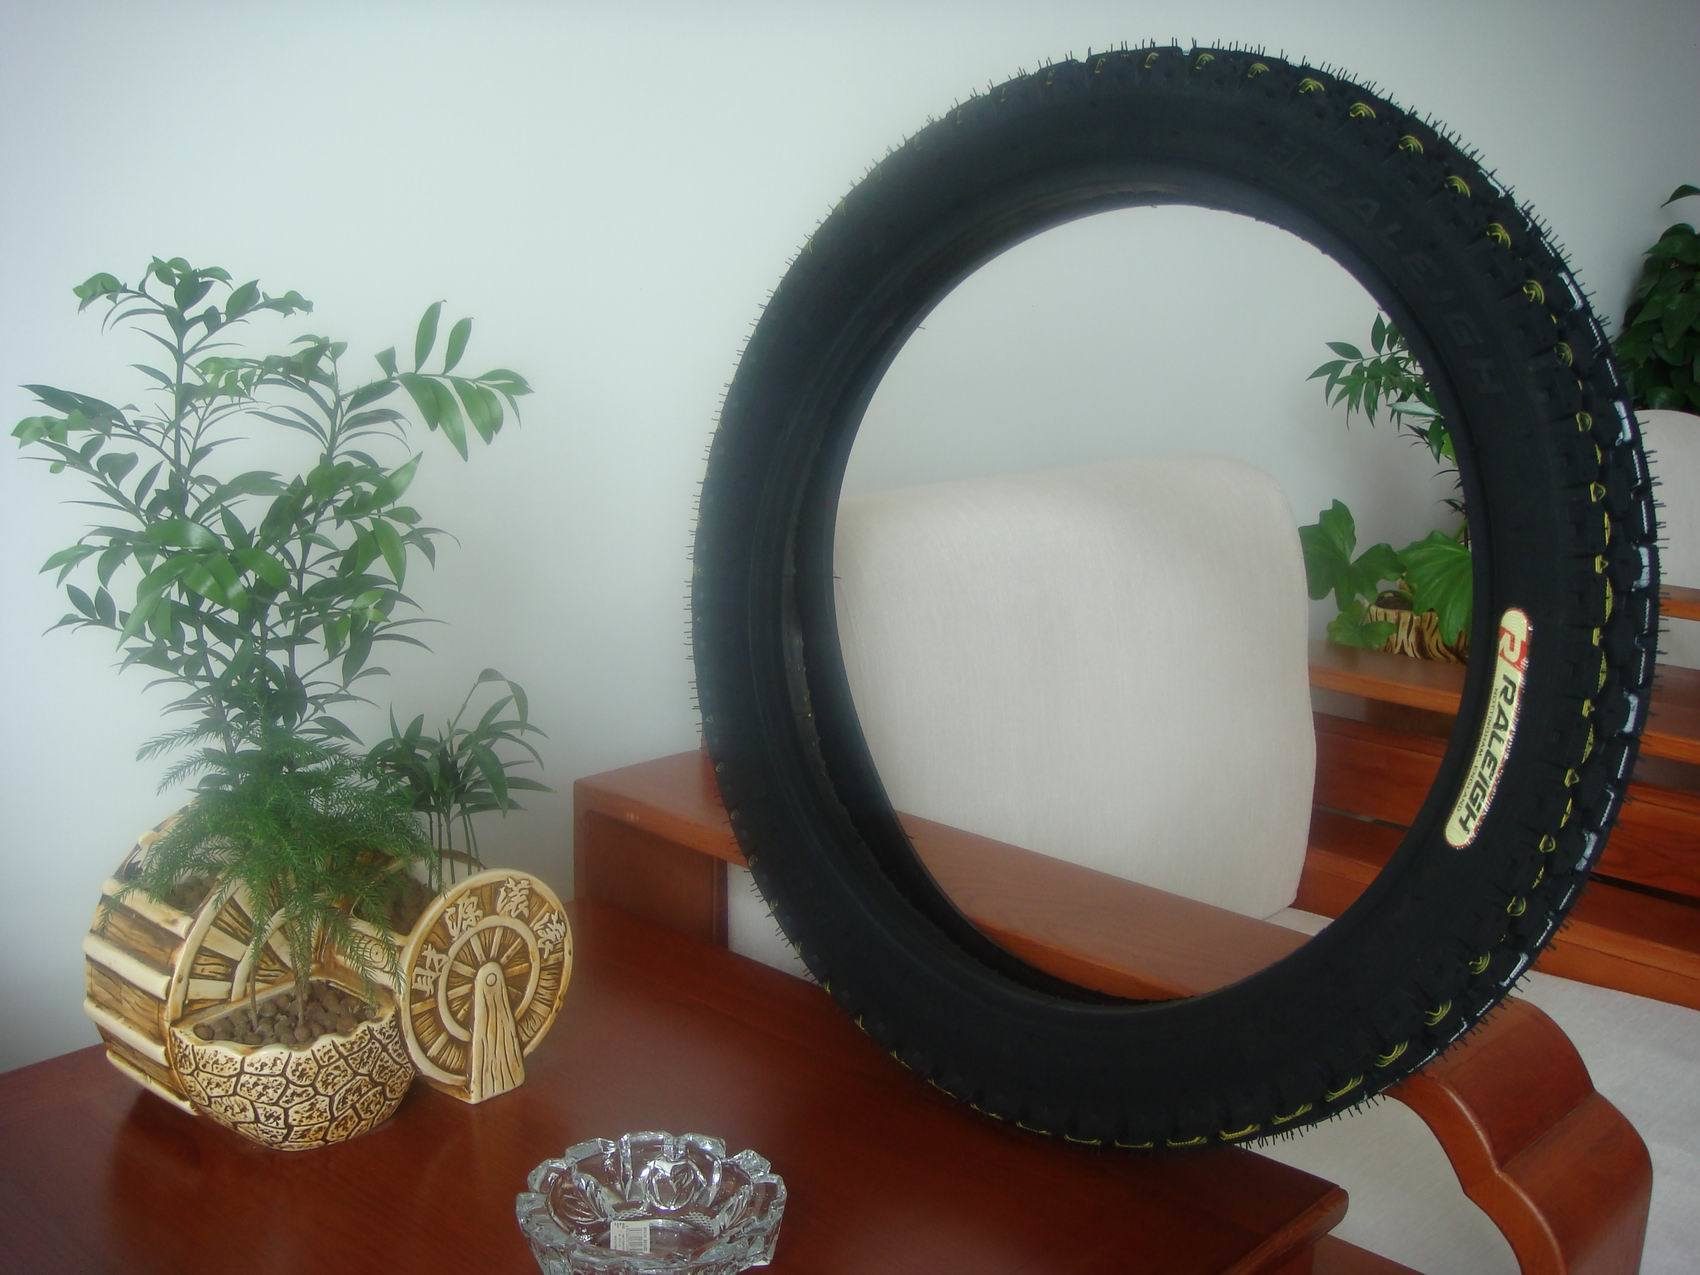 3.00-18 Motorycle Tyre